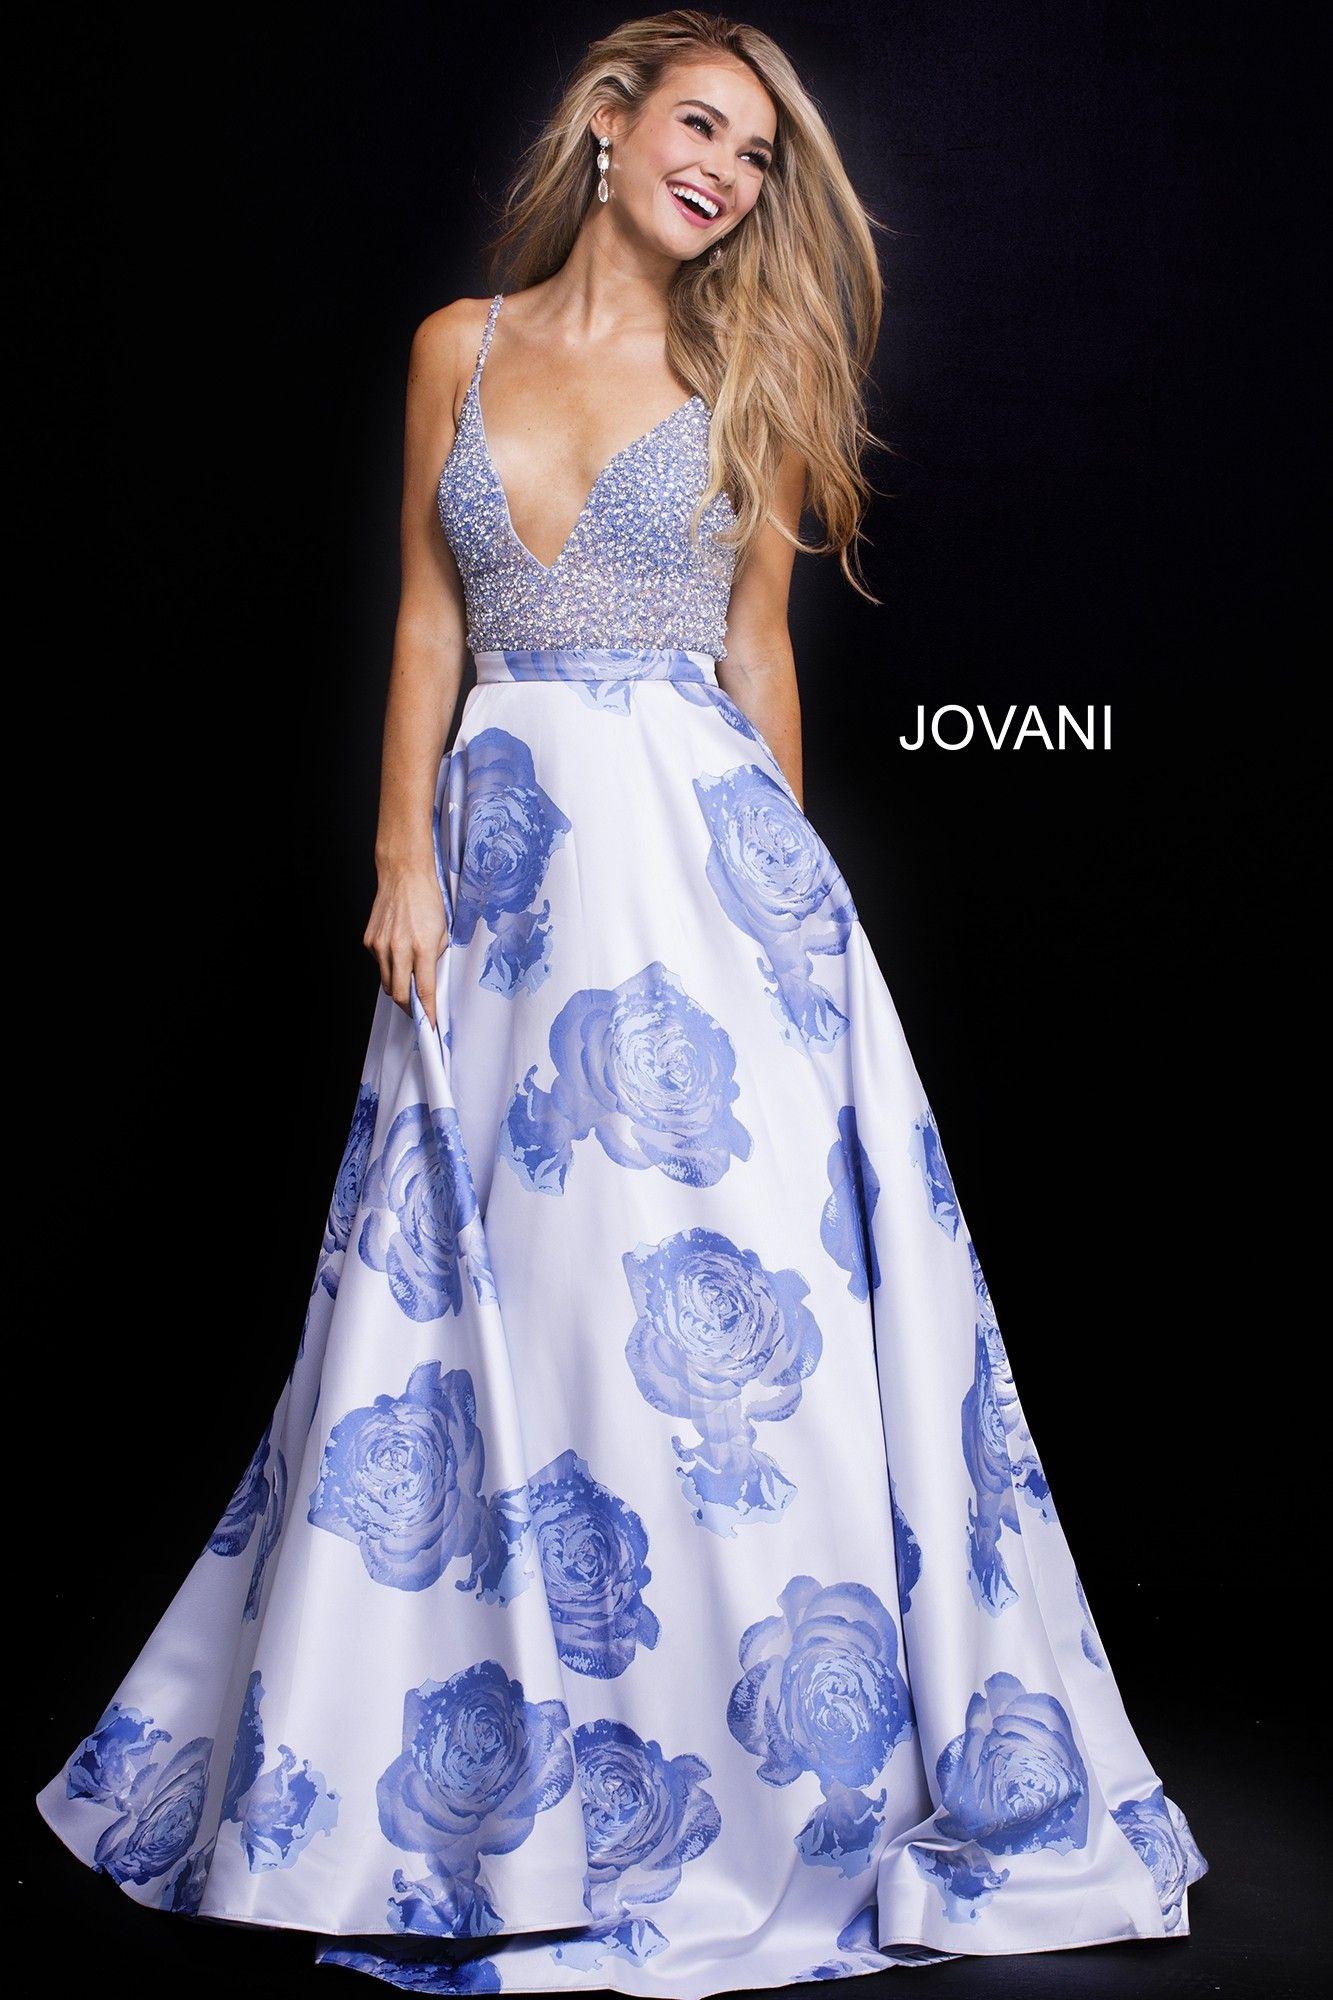 Jovani Dress with Bra